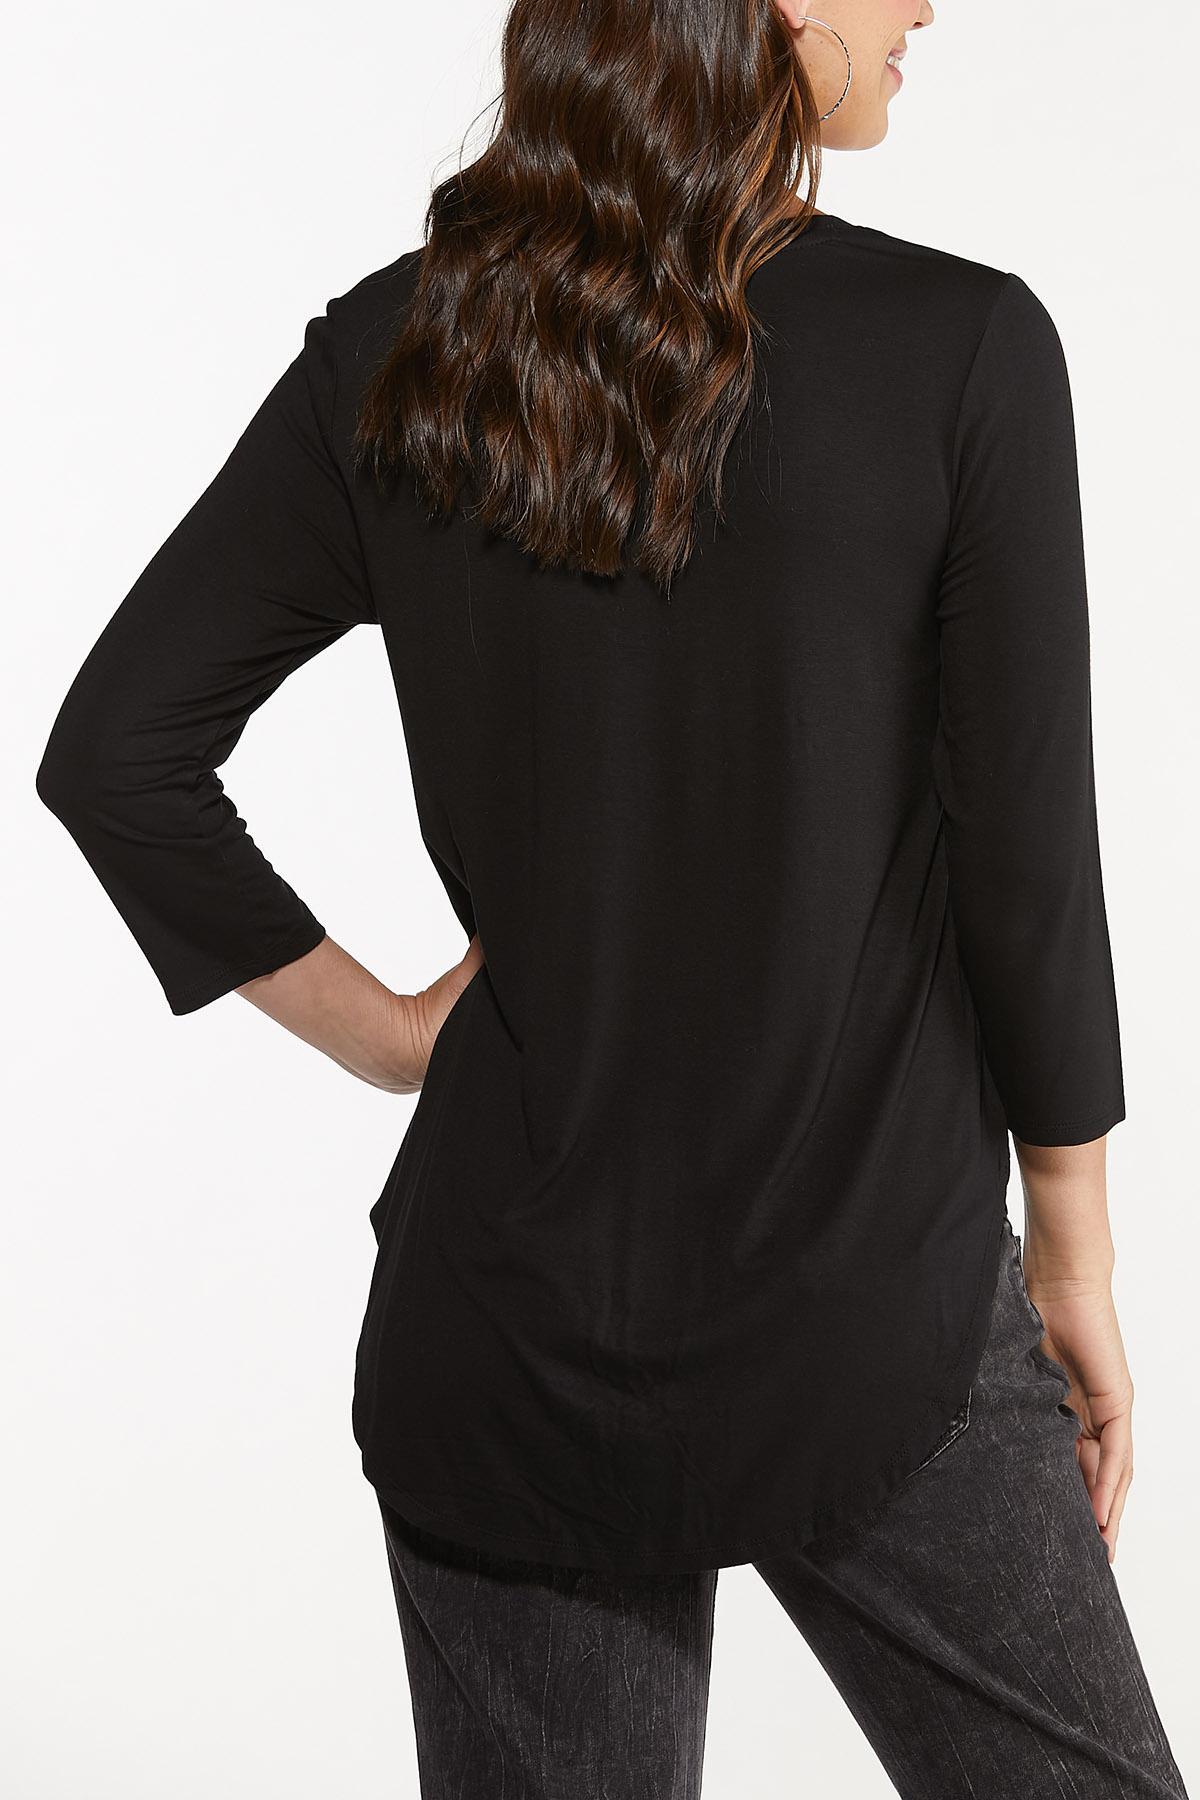 Plus Size Solid V-Neck Top (Item #44703910)